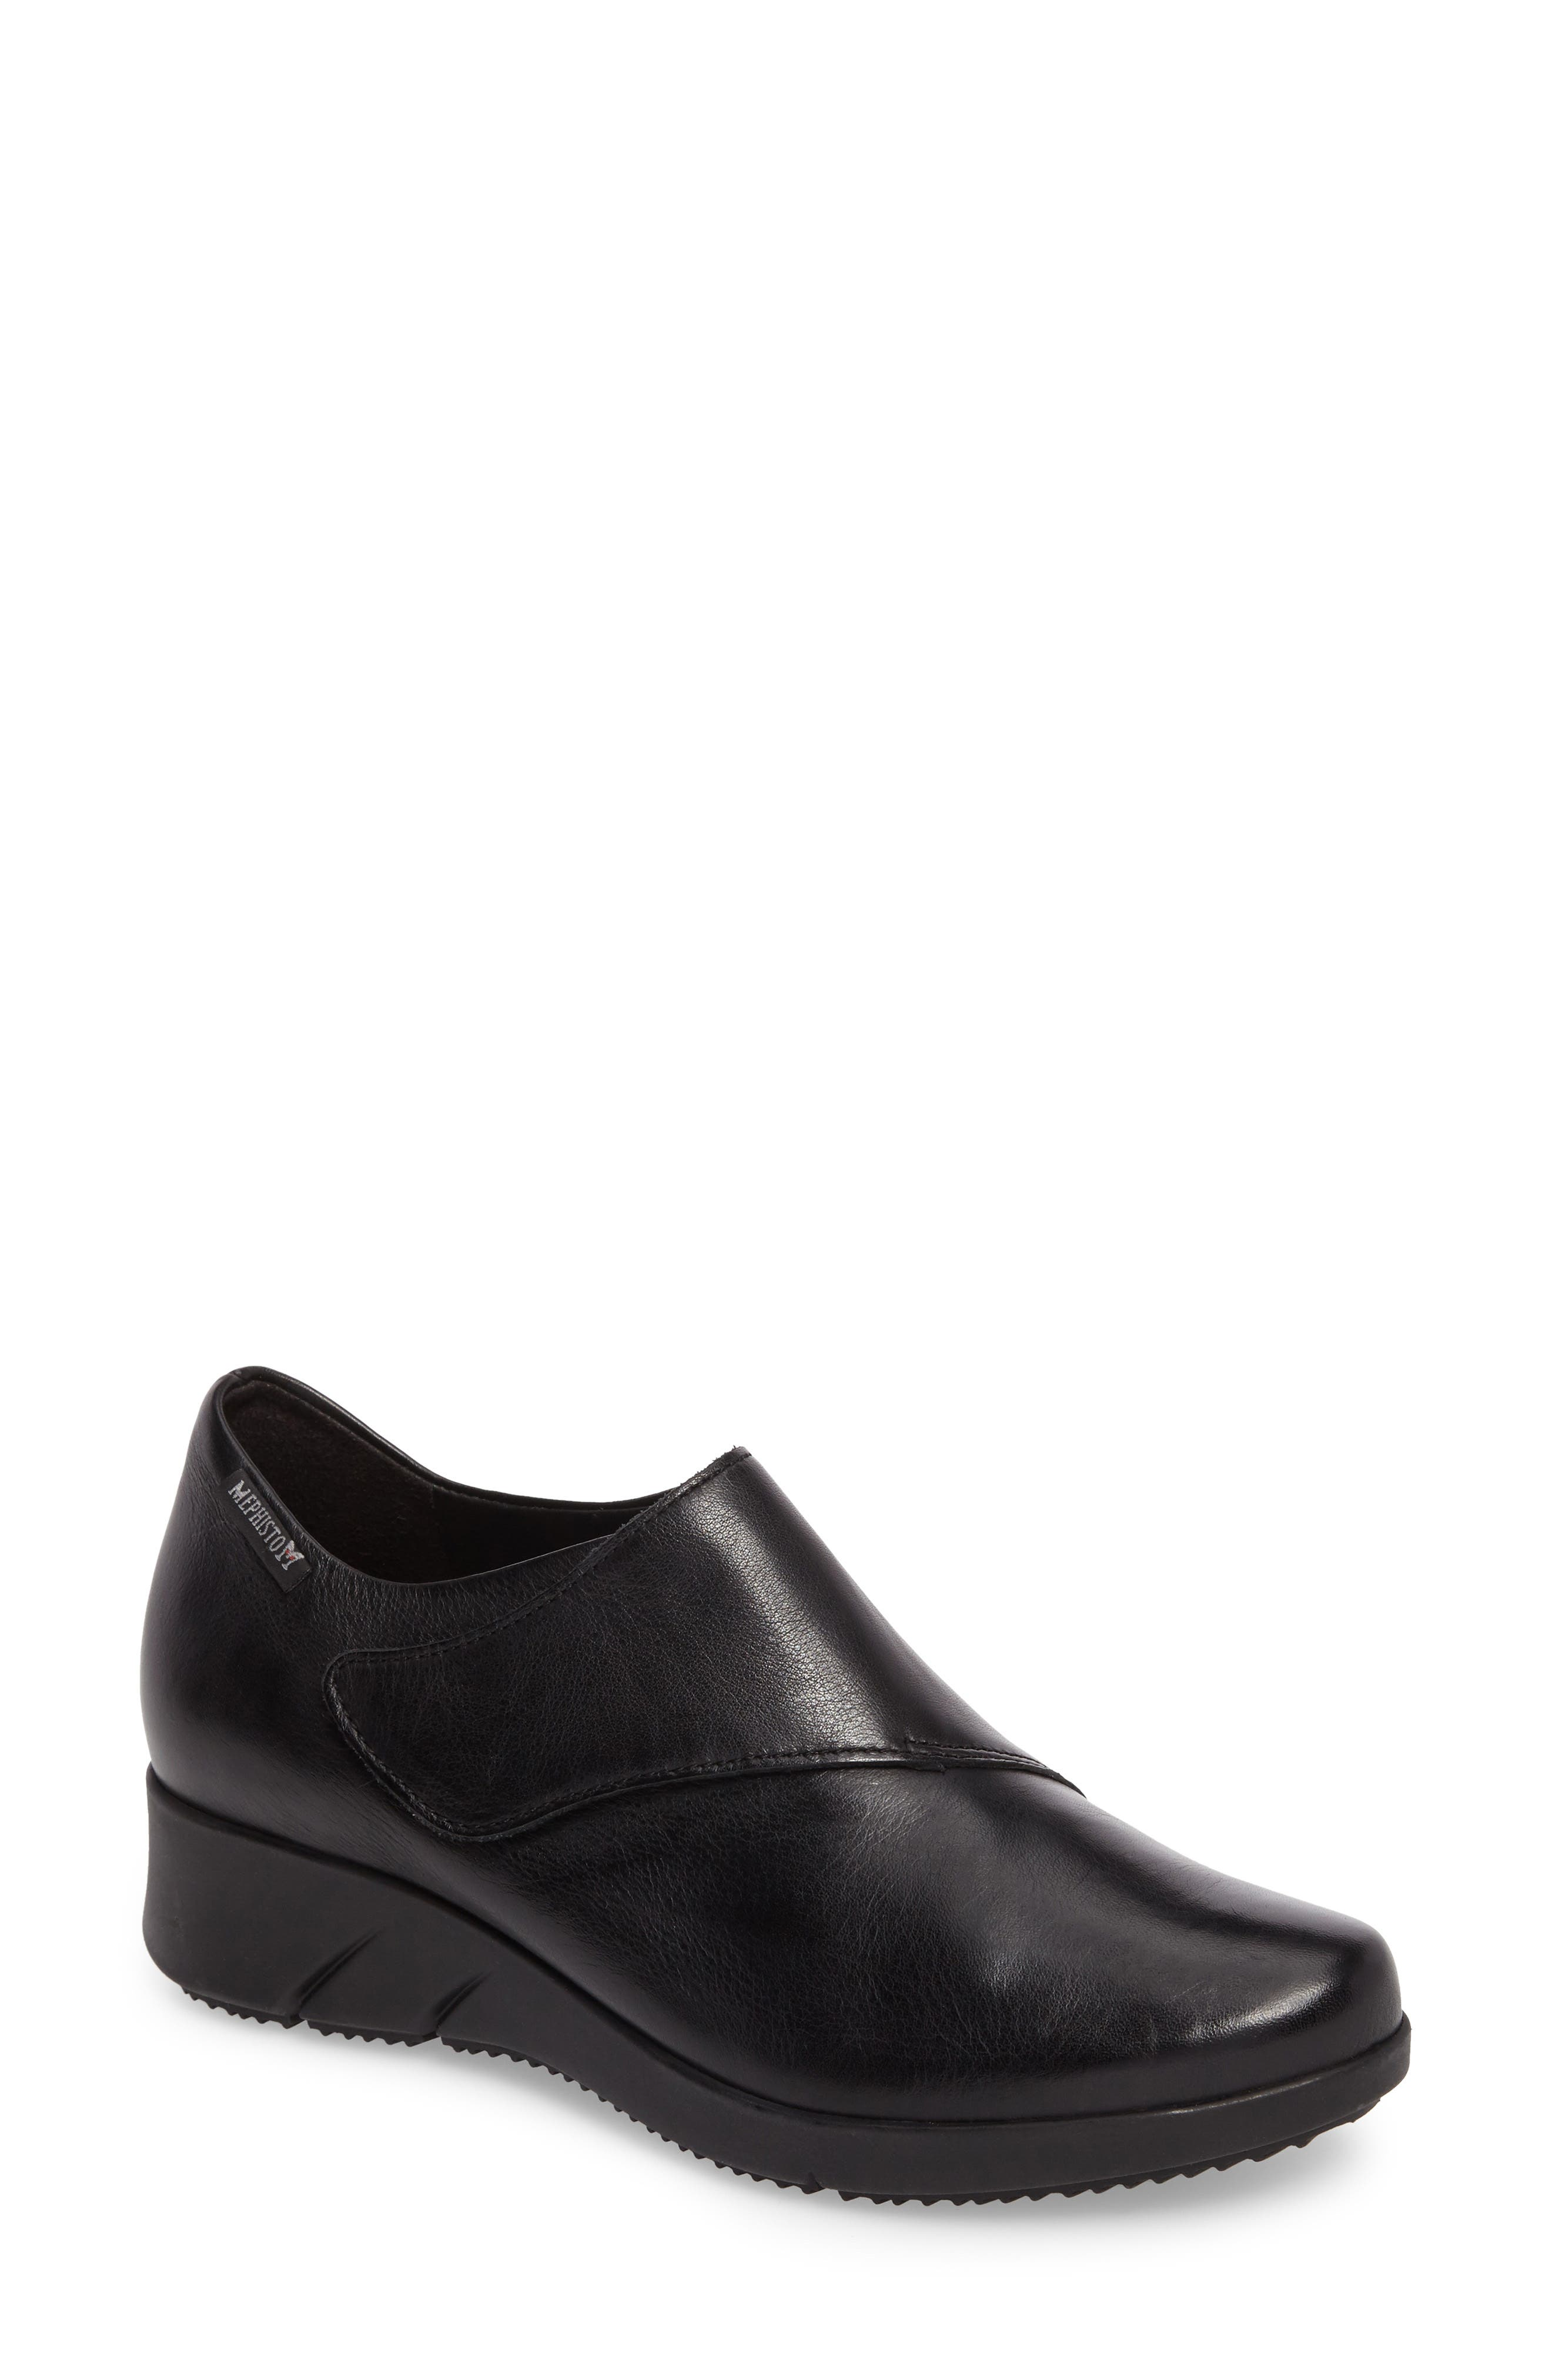 Marisa Flat in Black Calfskin Leather